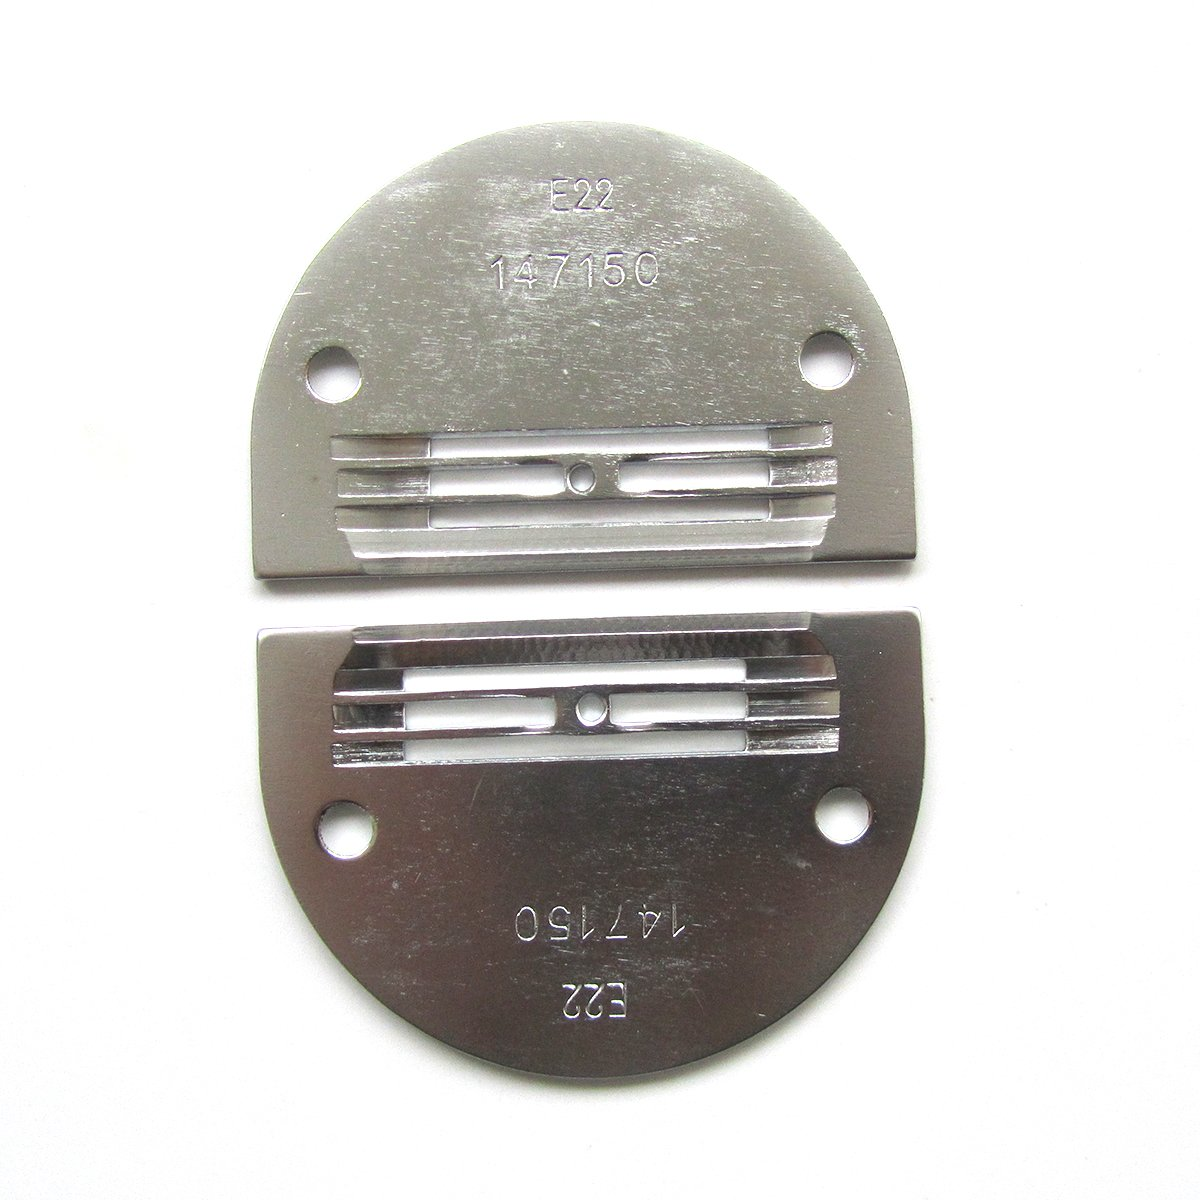 kunpeng - Industrial máquina de coser Aguja Placa 147150lgw - Luz a mediano para Brother Juki 2 pcs: Amazon.es: Hogar